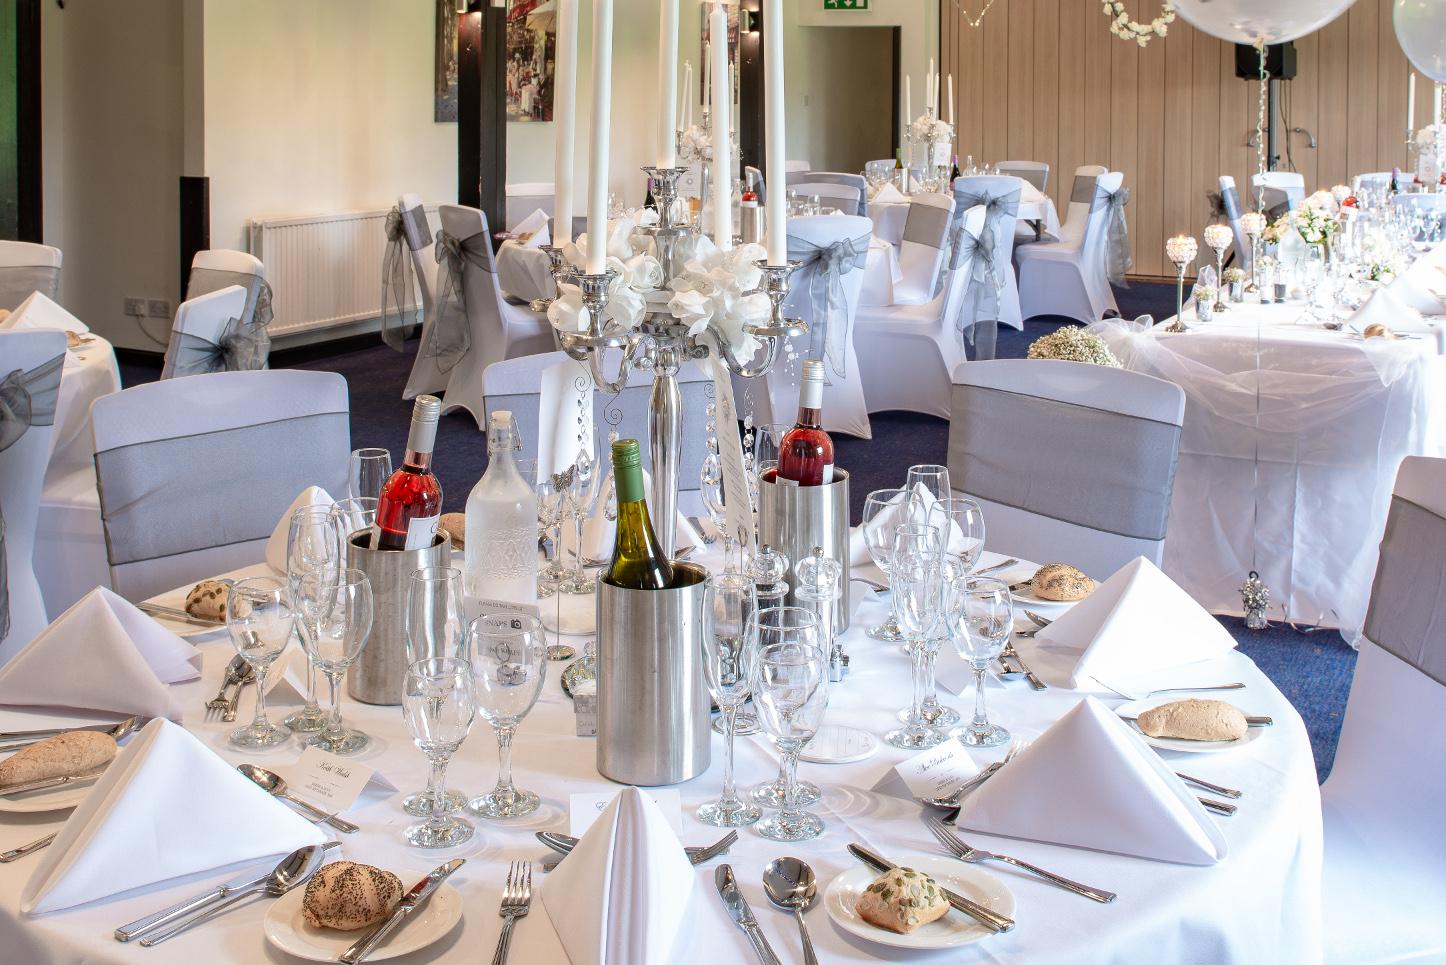 Goring and Streatley Weddings 6